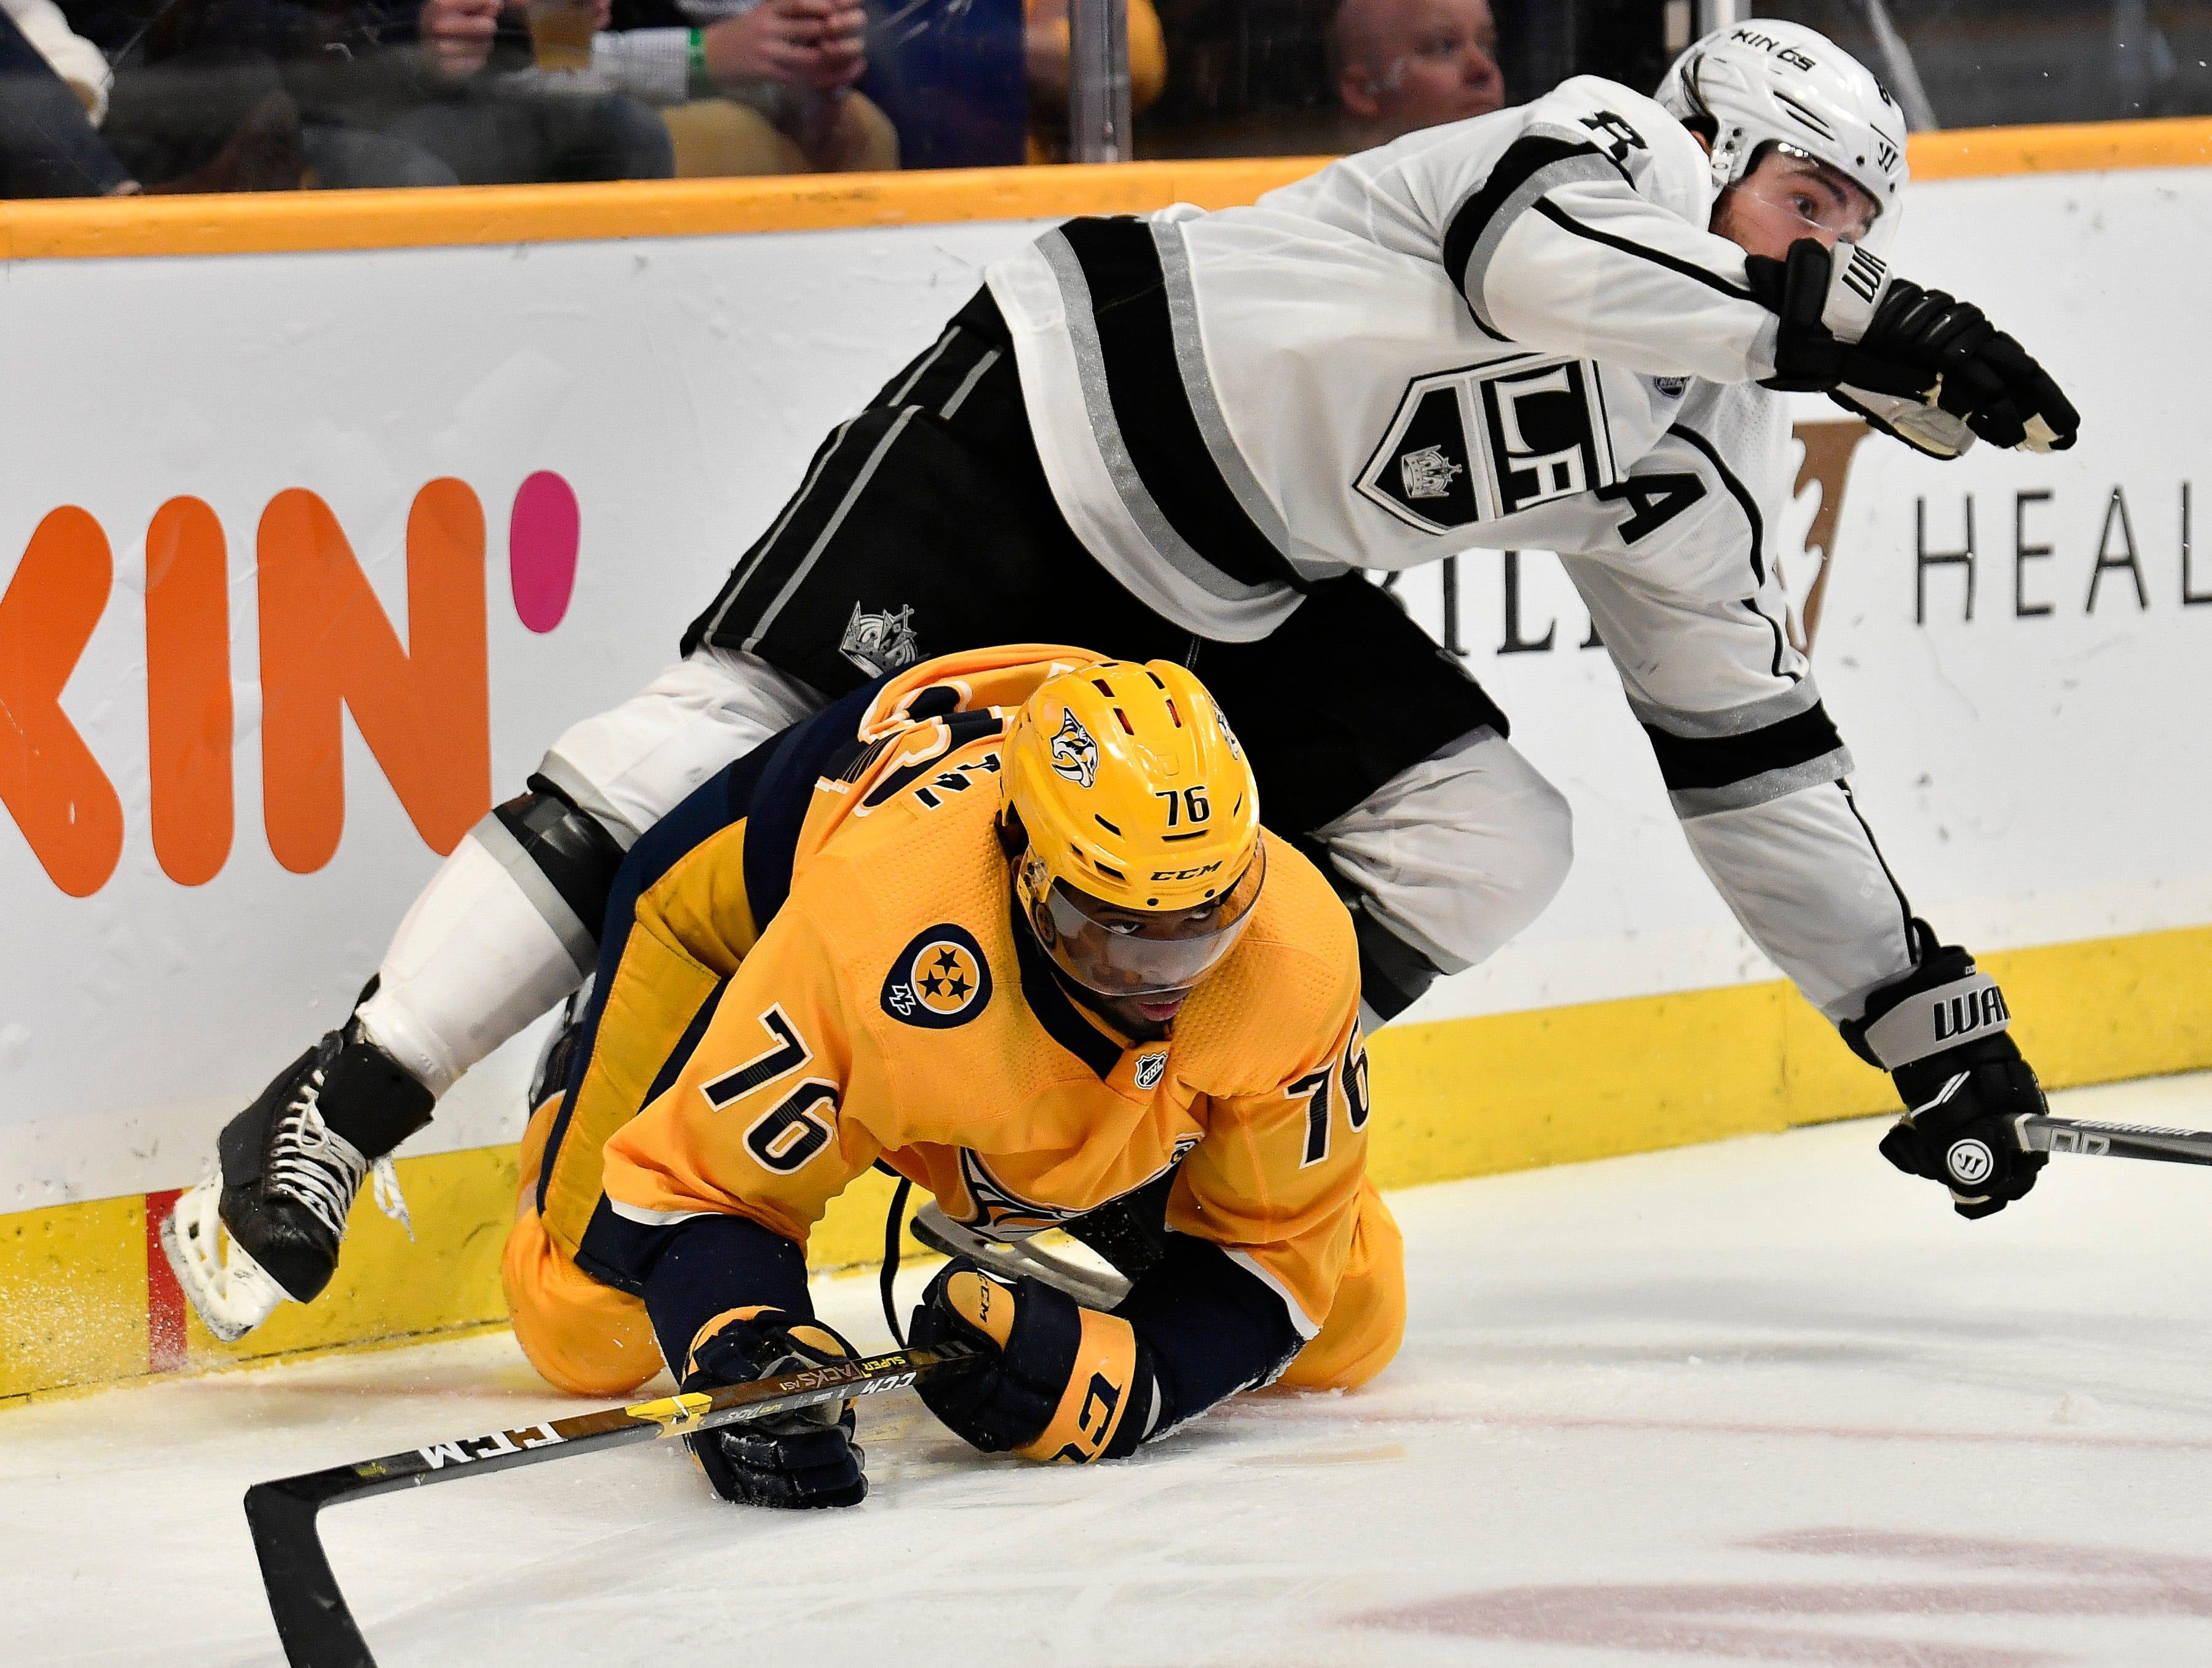 Feb. 21, 2019: Predators 2, Kings 1 -- Predators defenseman P.K. Subban (76) knocks Kings defenseman Drew Doughty (8) to the ice during the third period at Bridgestone Arena Thursday, Feb. 21, 2019 in Nashville, Tenn.